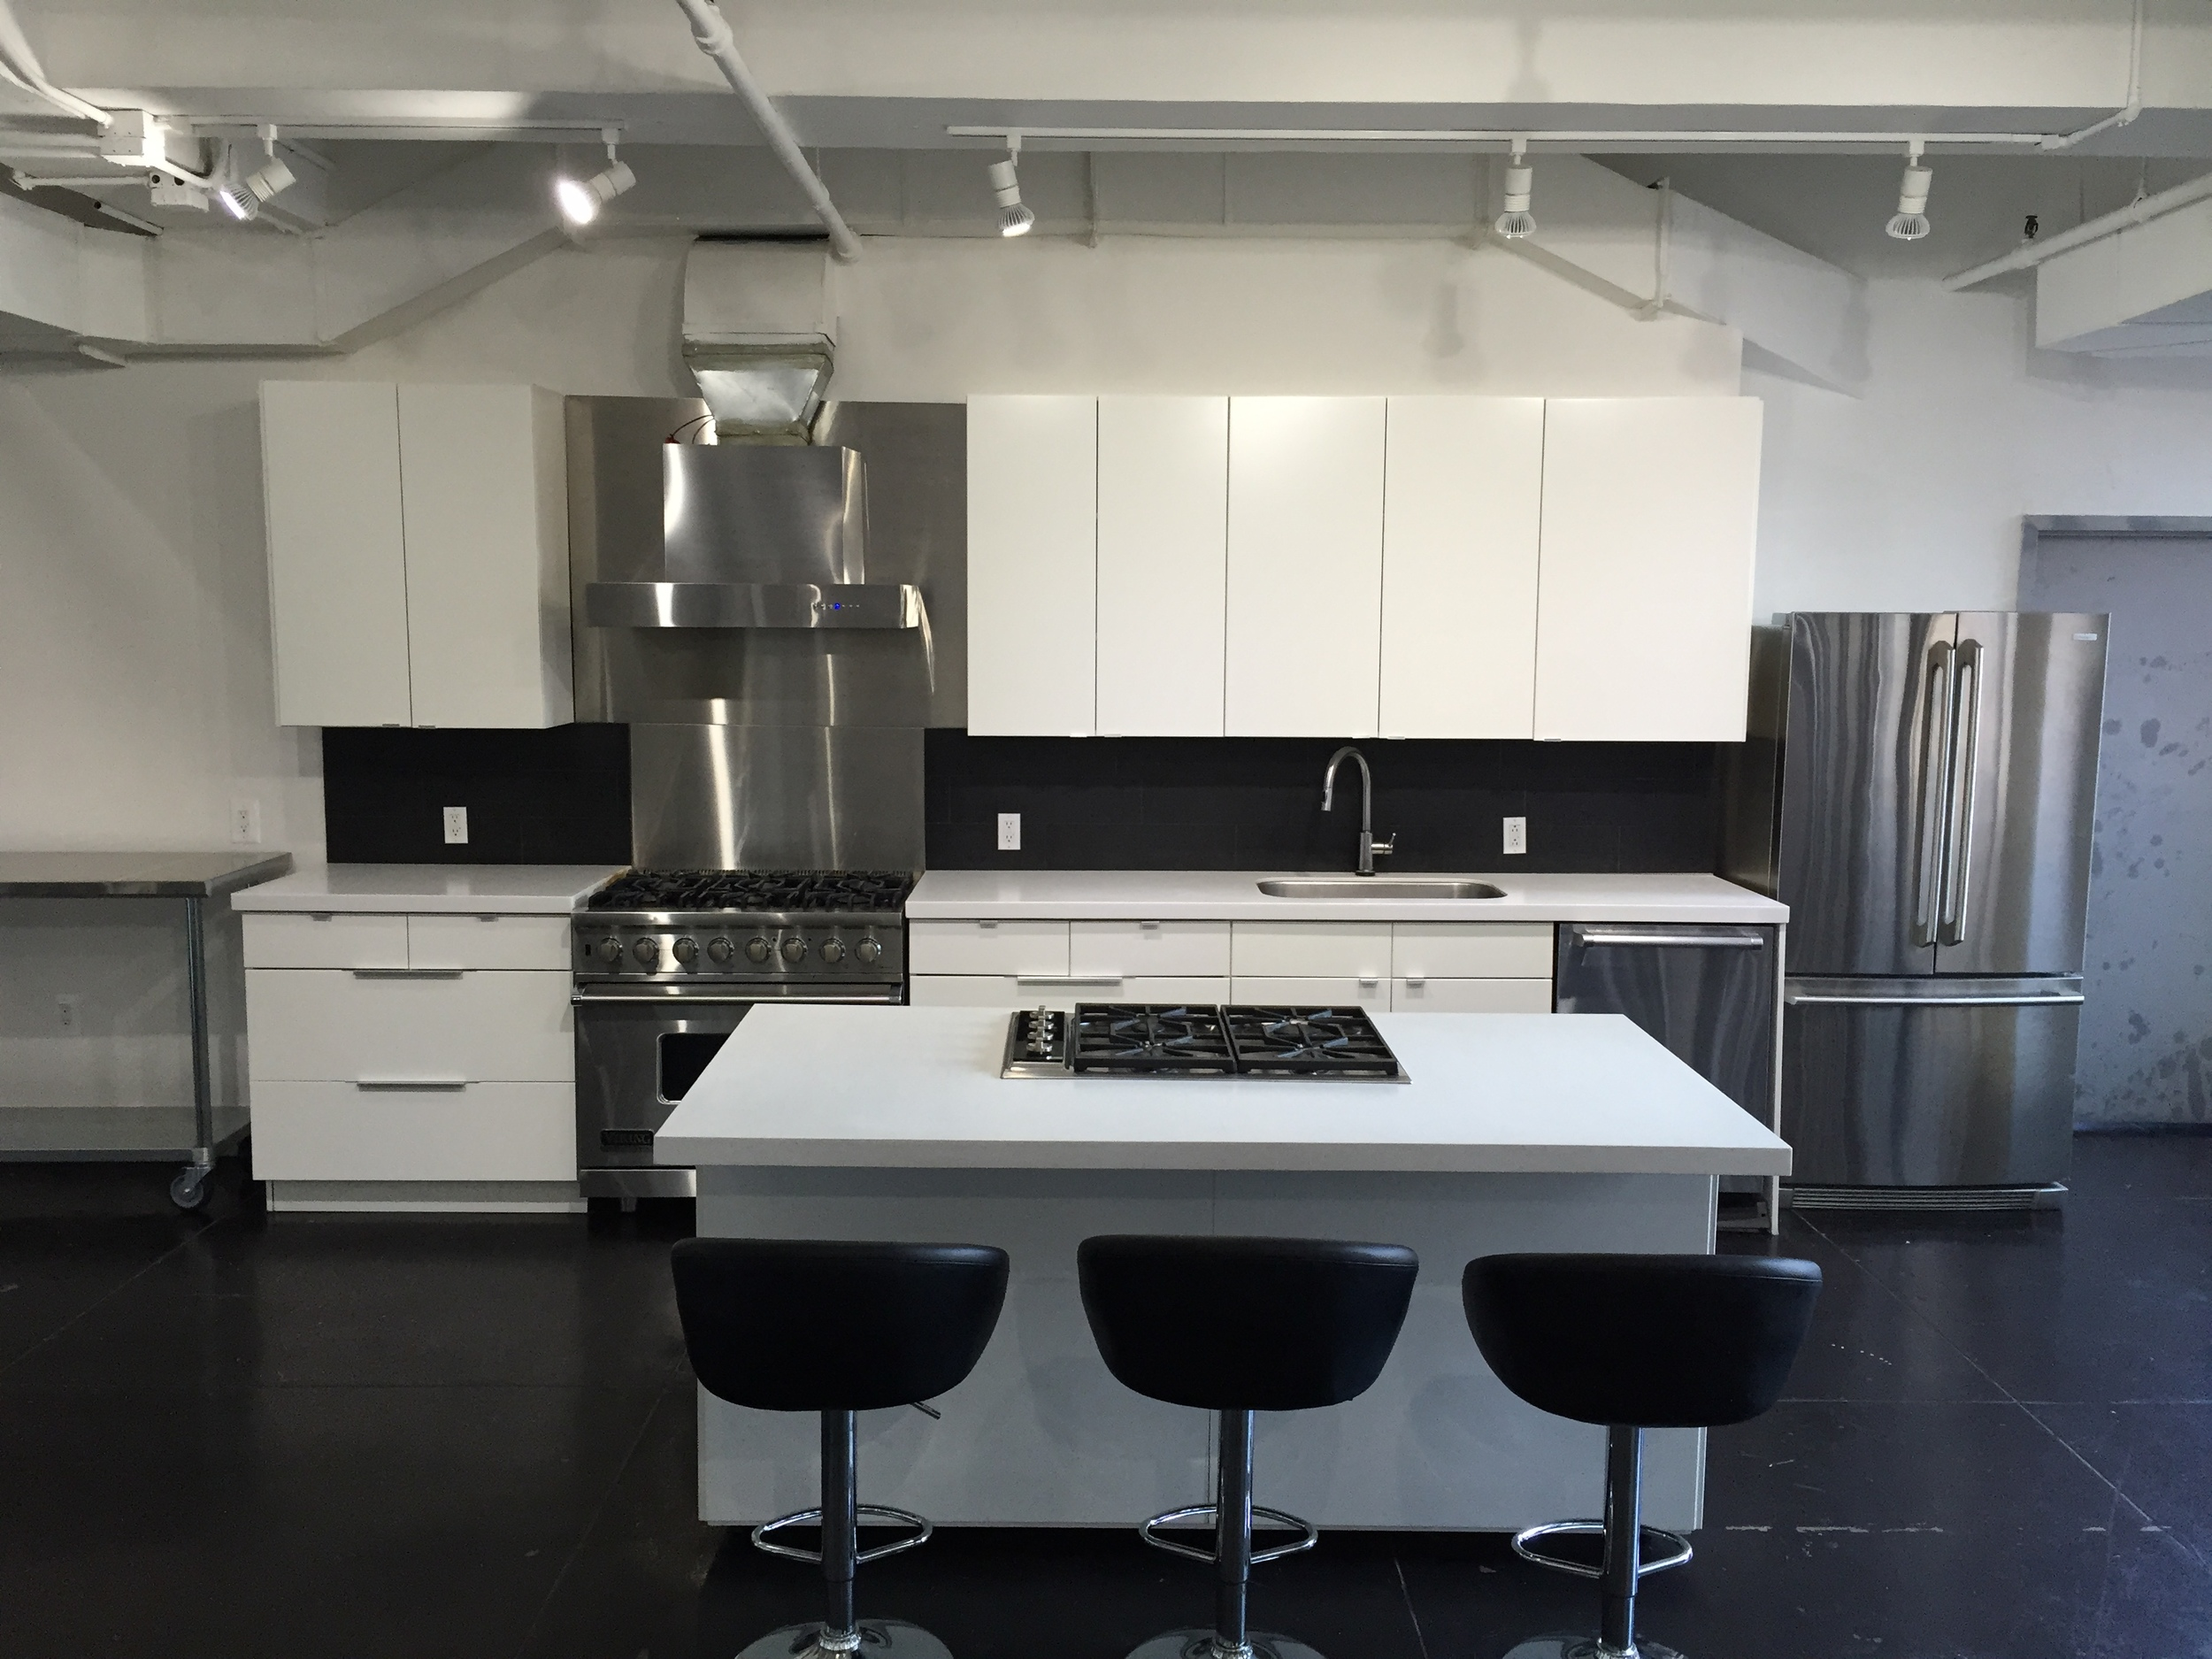 Shooting Kitchen 7.JPG